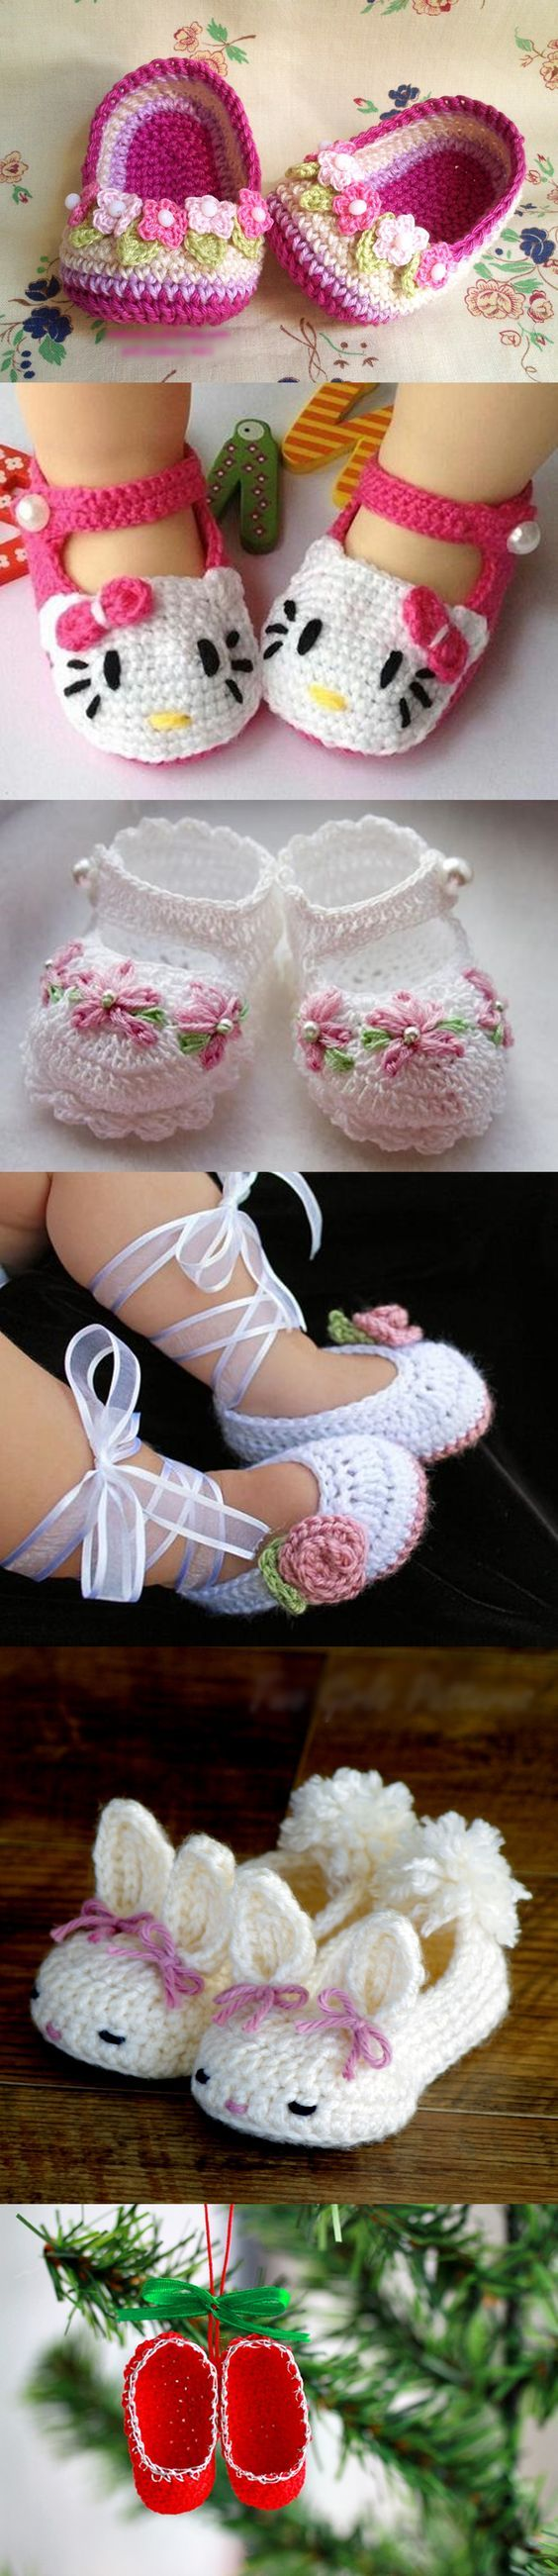 Wonderful DIY Mini Crochet Slippers | WonderfulDIY.com:                                                                                                                                                                                 More                                                                                                                                                                                 More